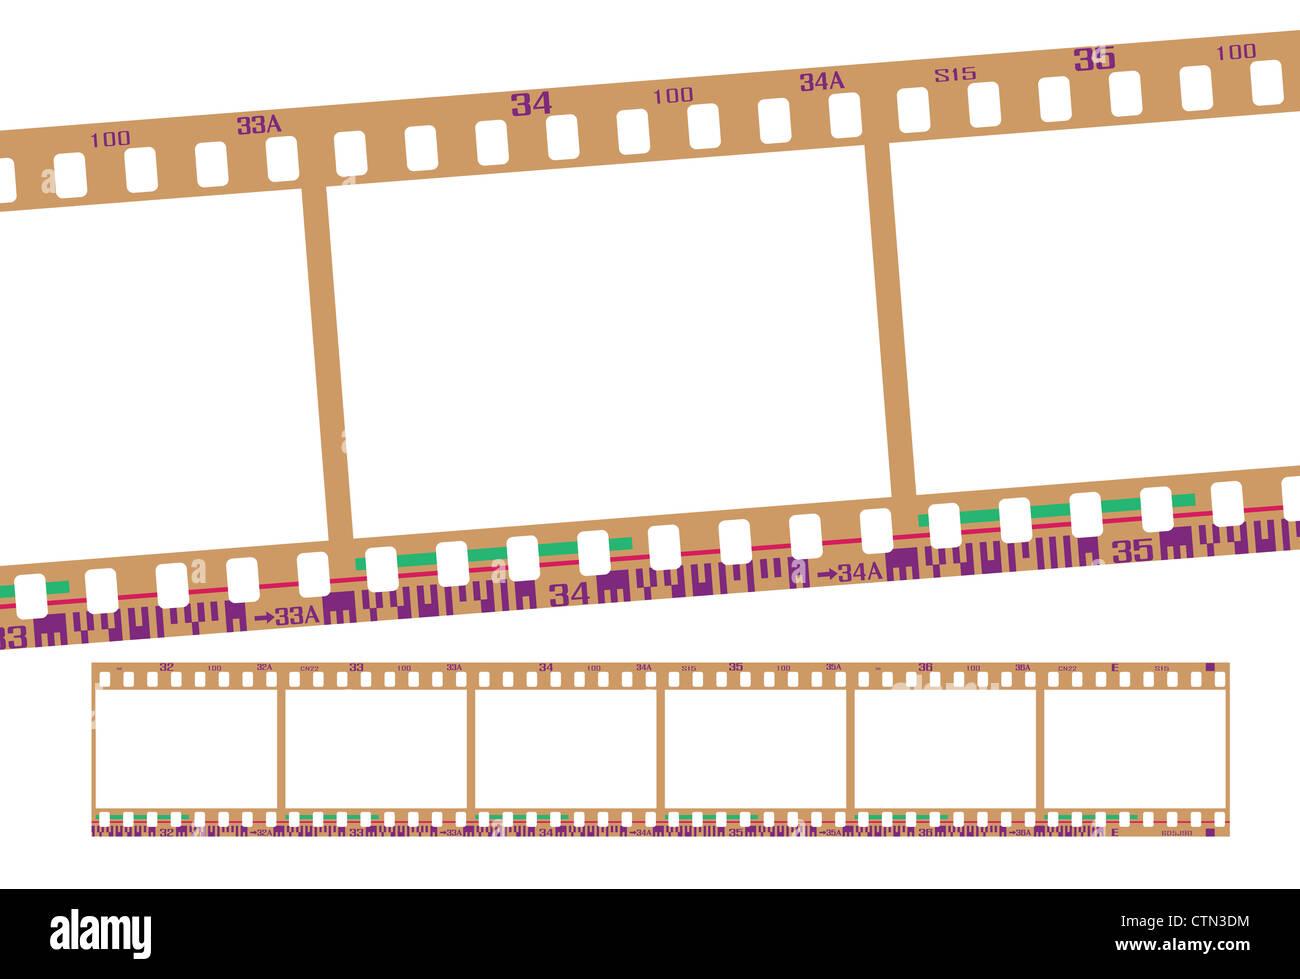 Film strip with realistic negative color continuous frames stock film strip with realistic negative color continuous frames accurate dimension and details jeuxipadfo Image collections